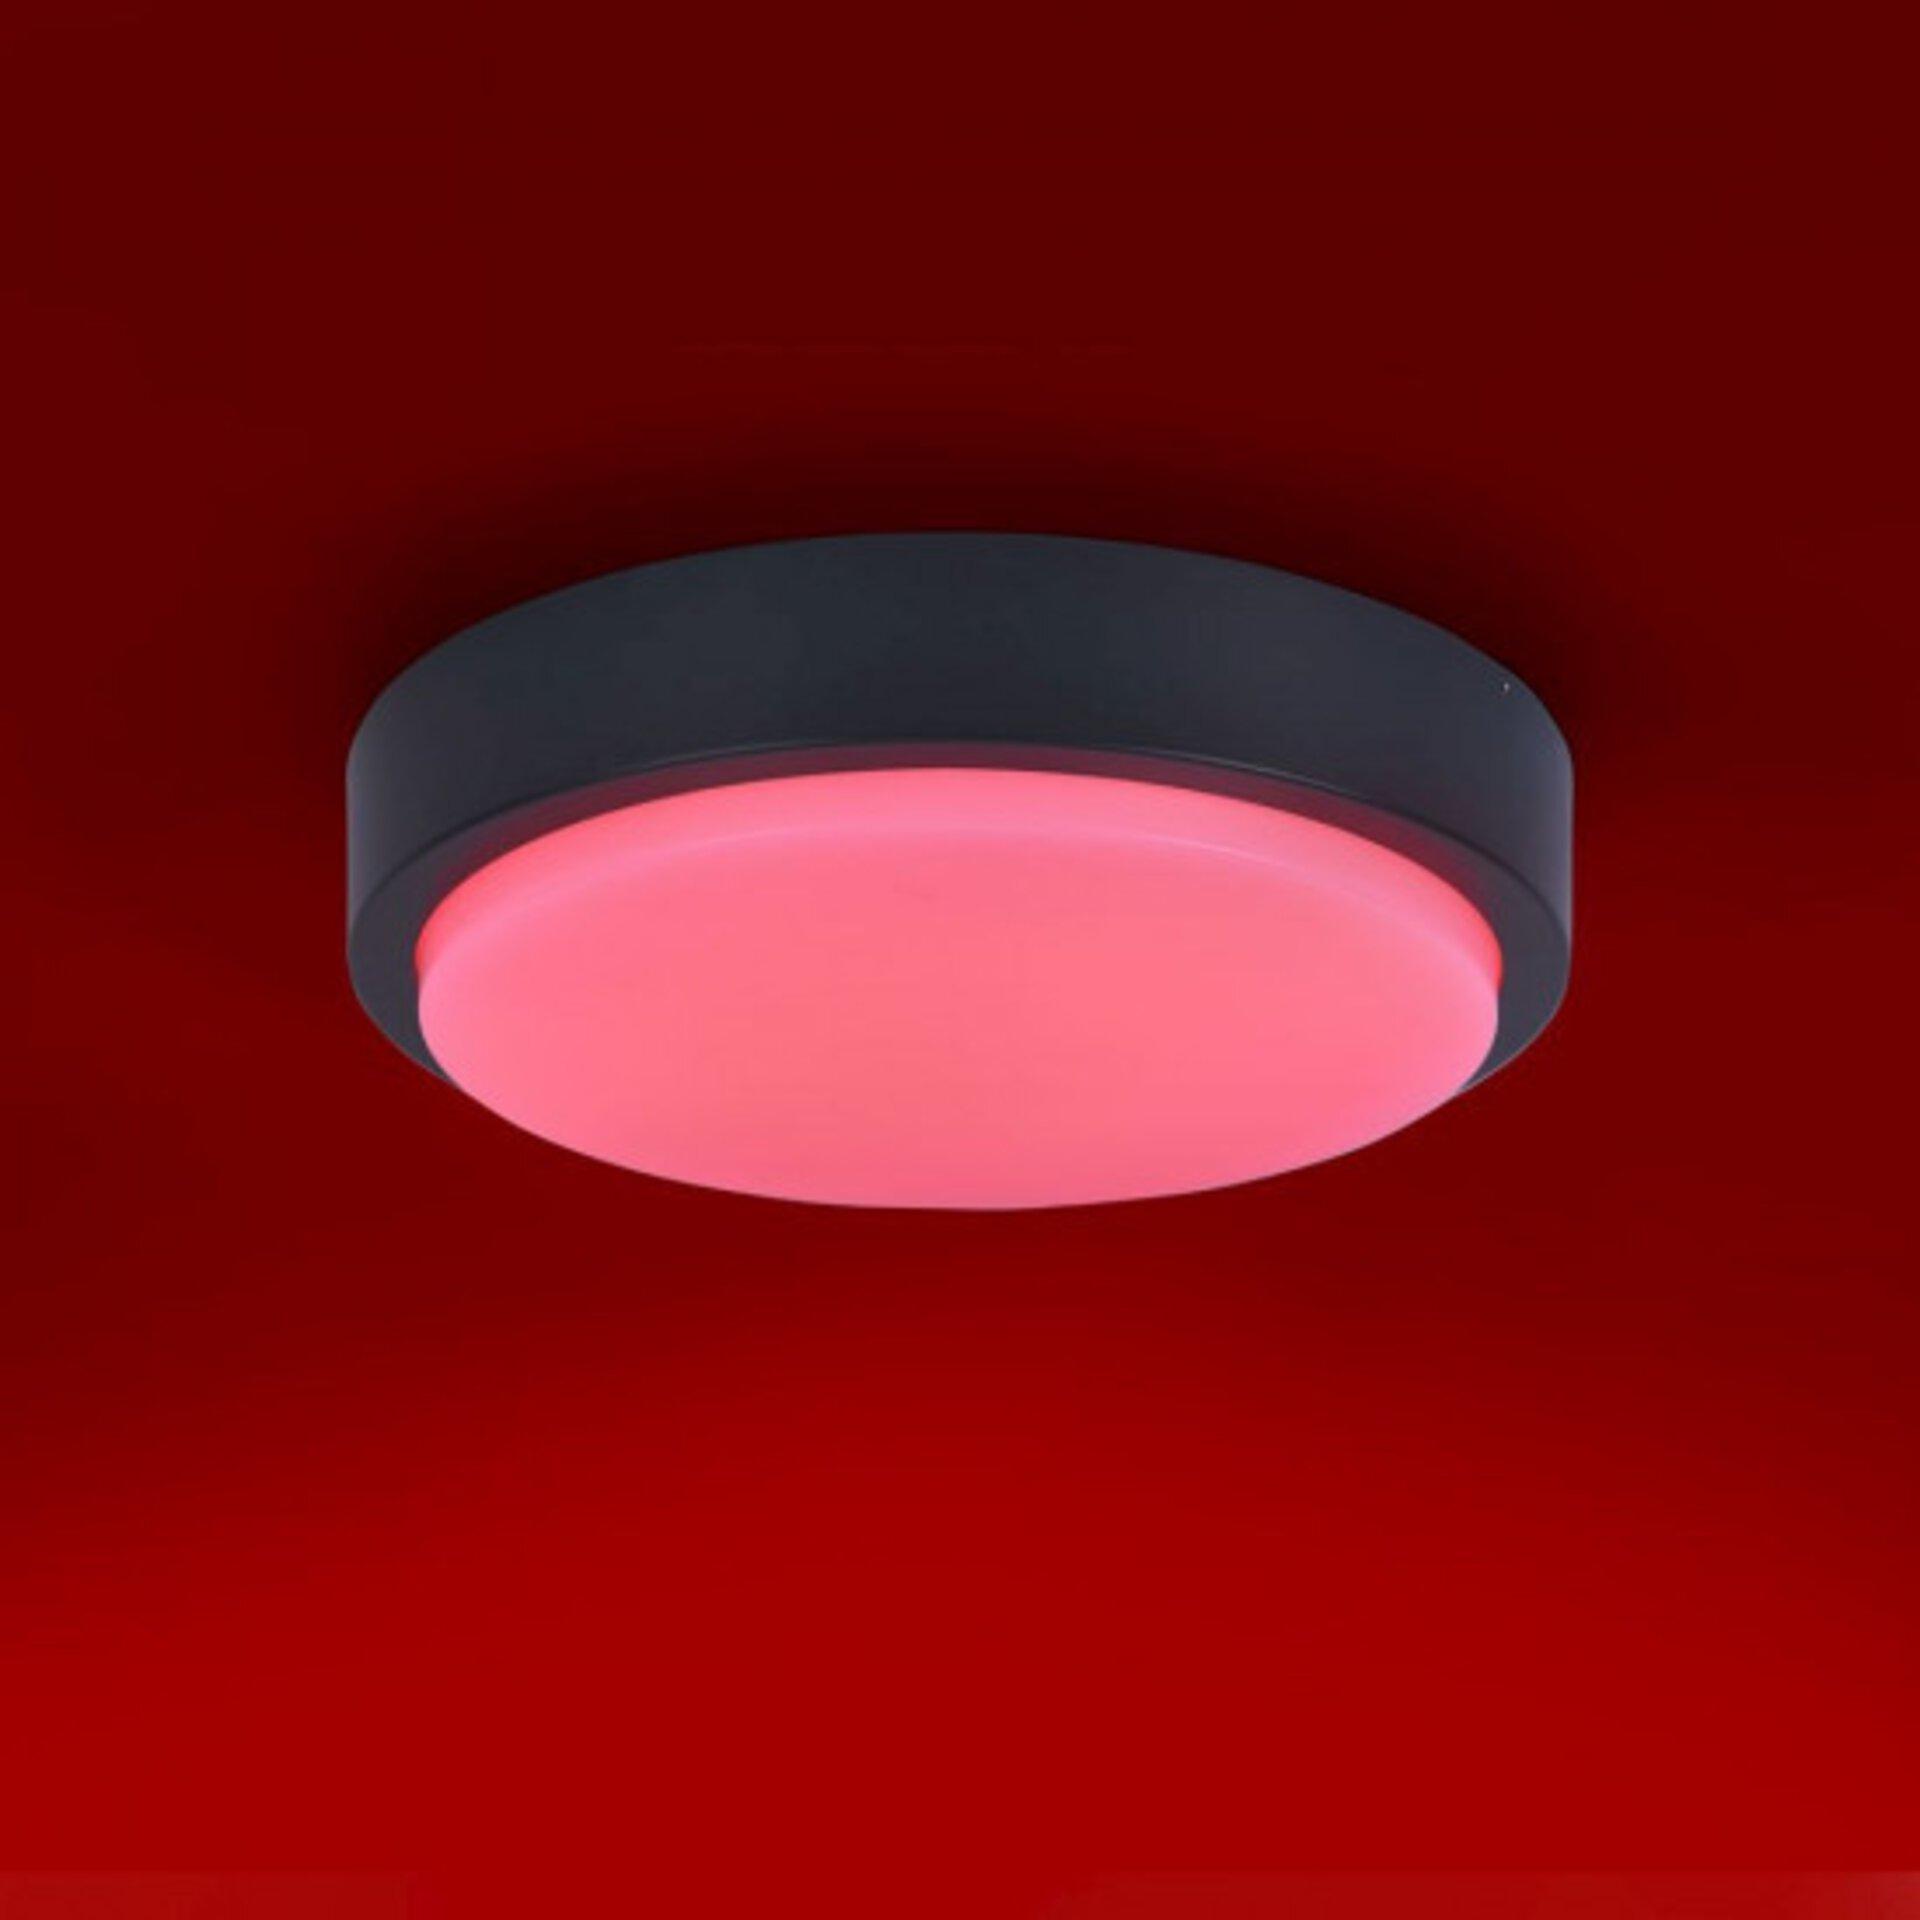 Smart-Home-Leuchten Q-LENNY Paul Neuhaus Metall grau 36 x 8 x 36 cm